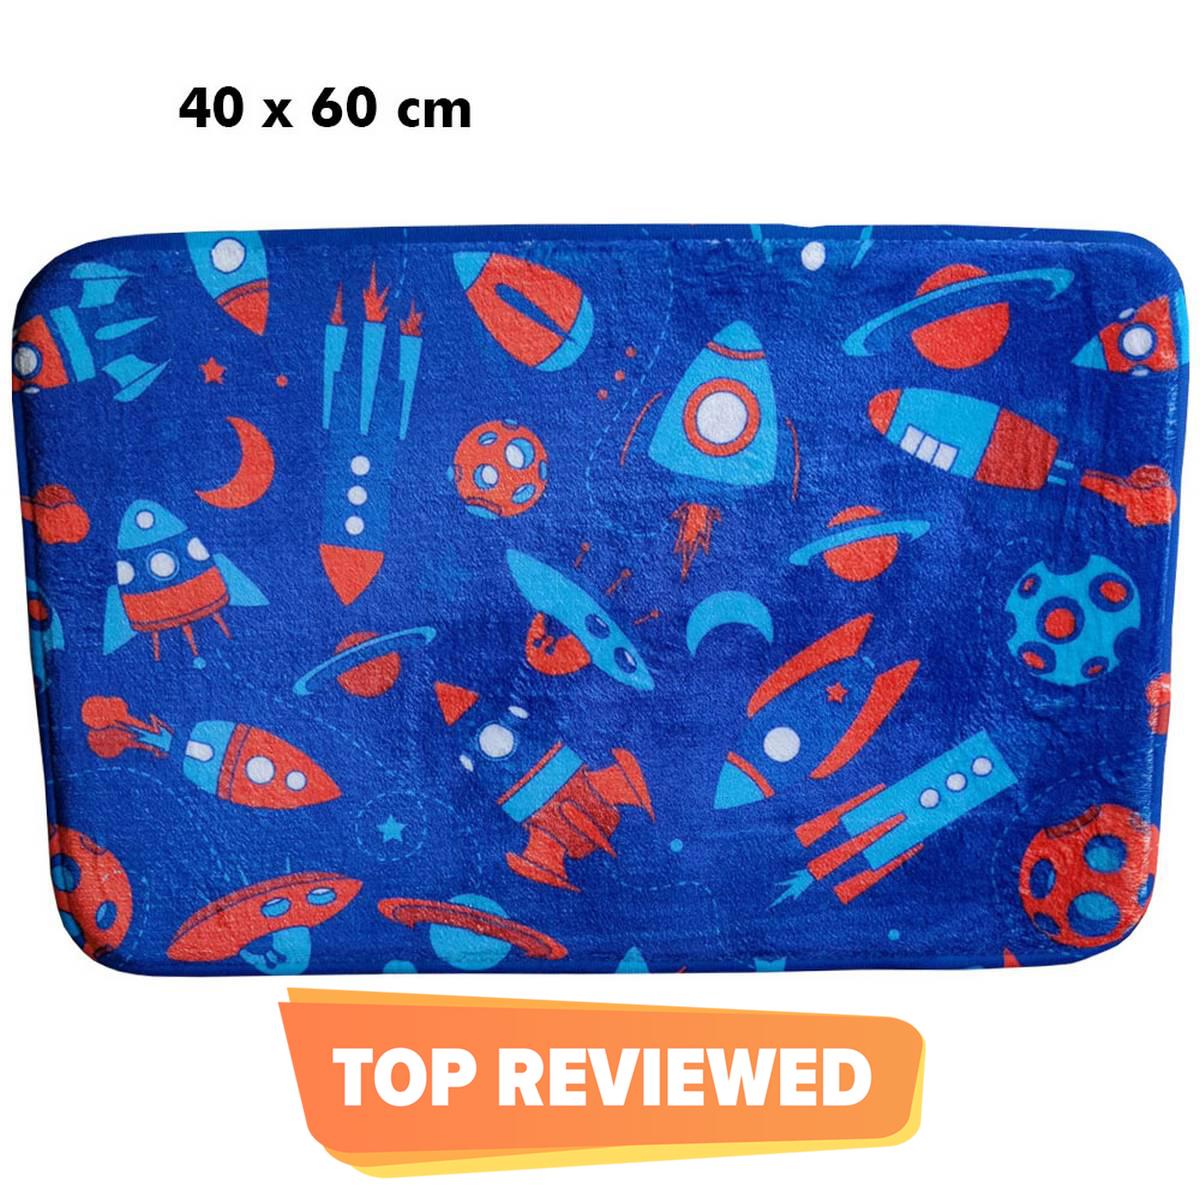 Relaxsit Foamy Bath Mats Plain Non Slip,  Memory Foam Bath Carpet, Microfibre  Rectangle Absorbent, size 50 x 80Cm or 40 x 60 cm